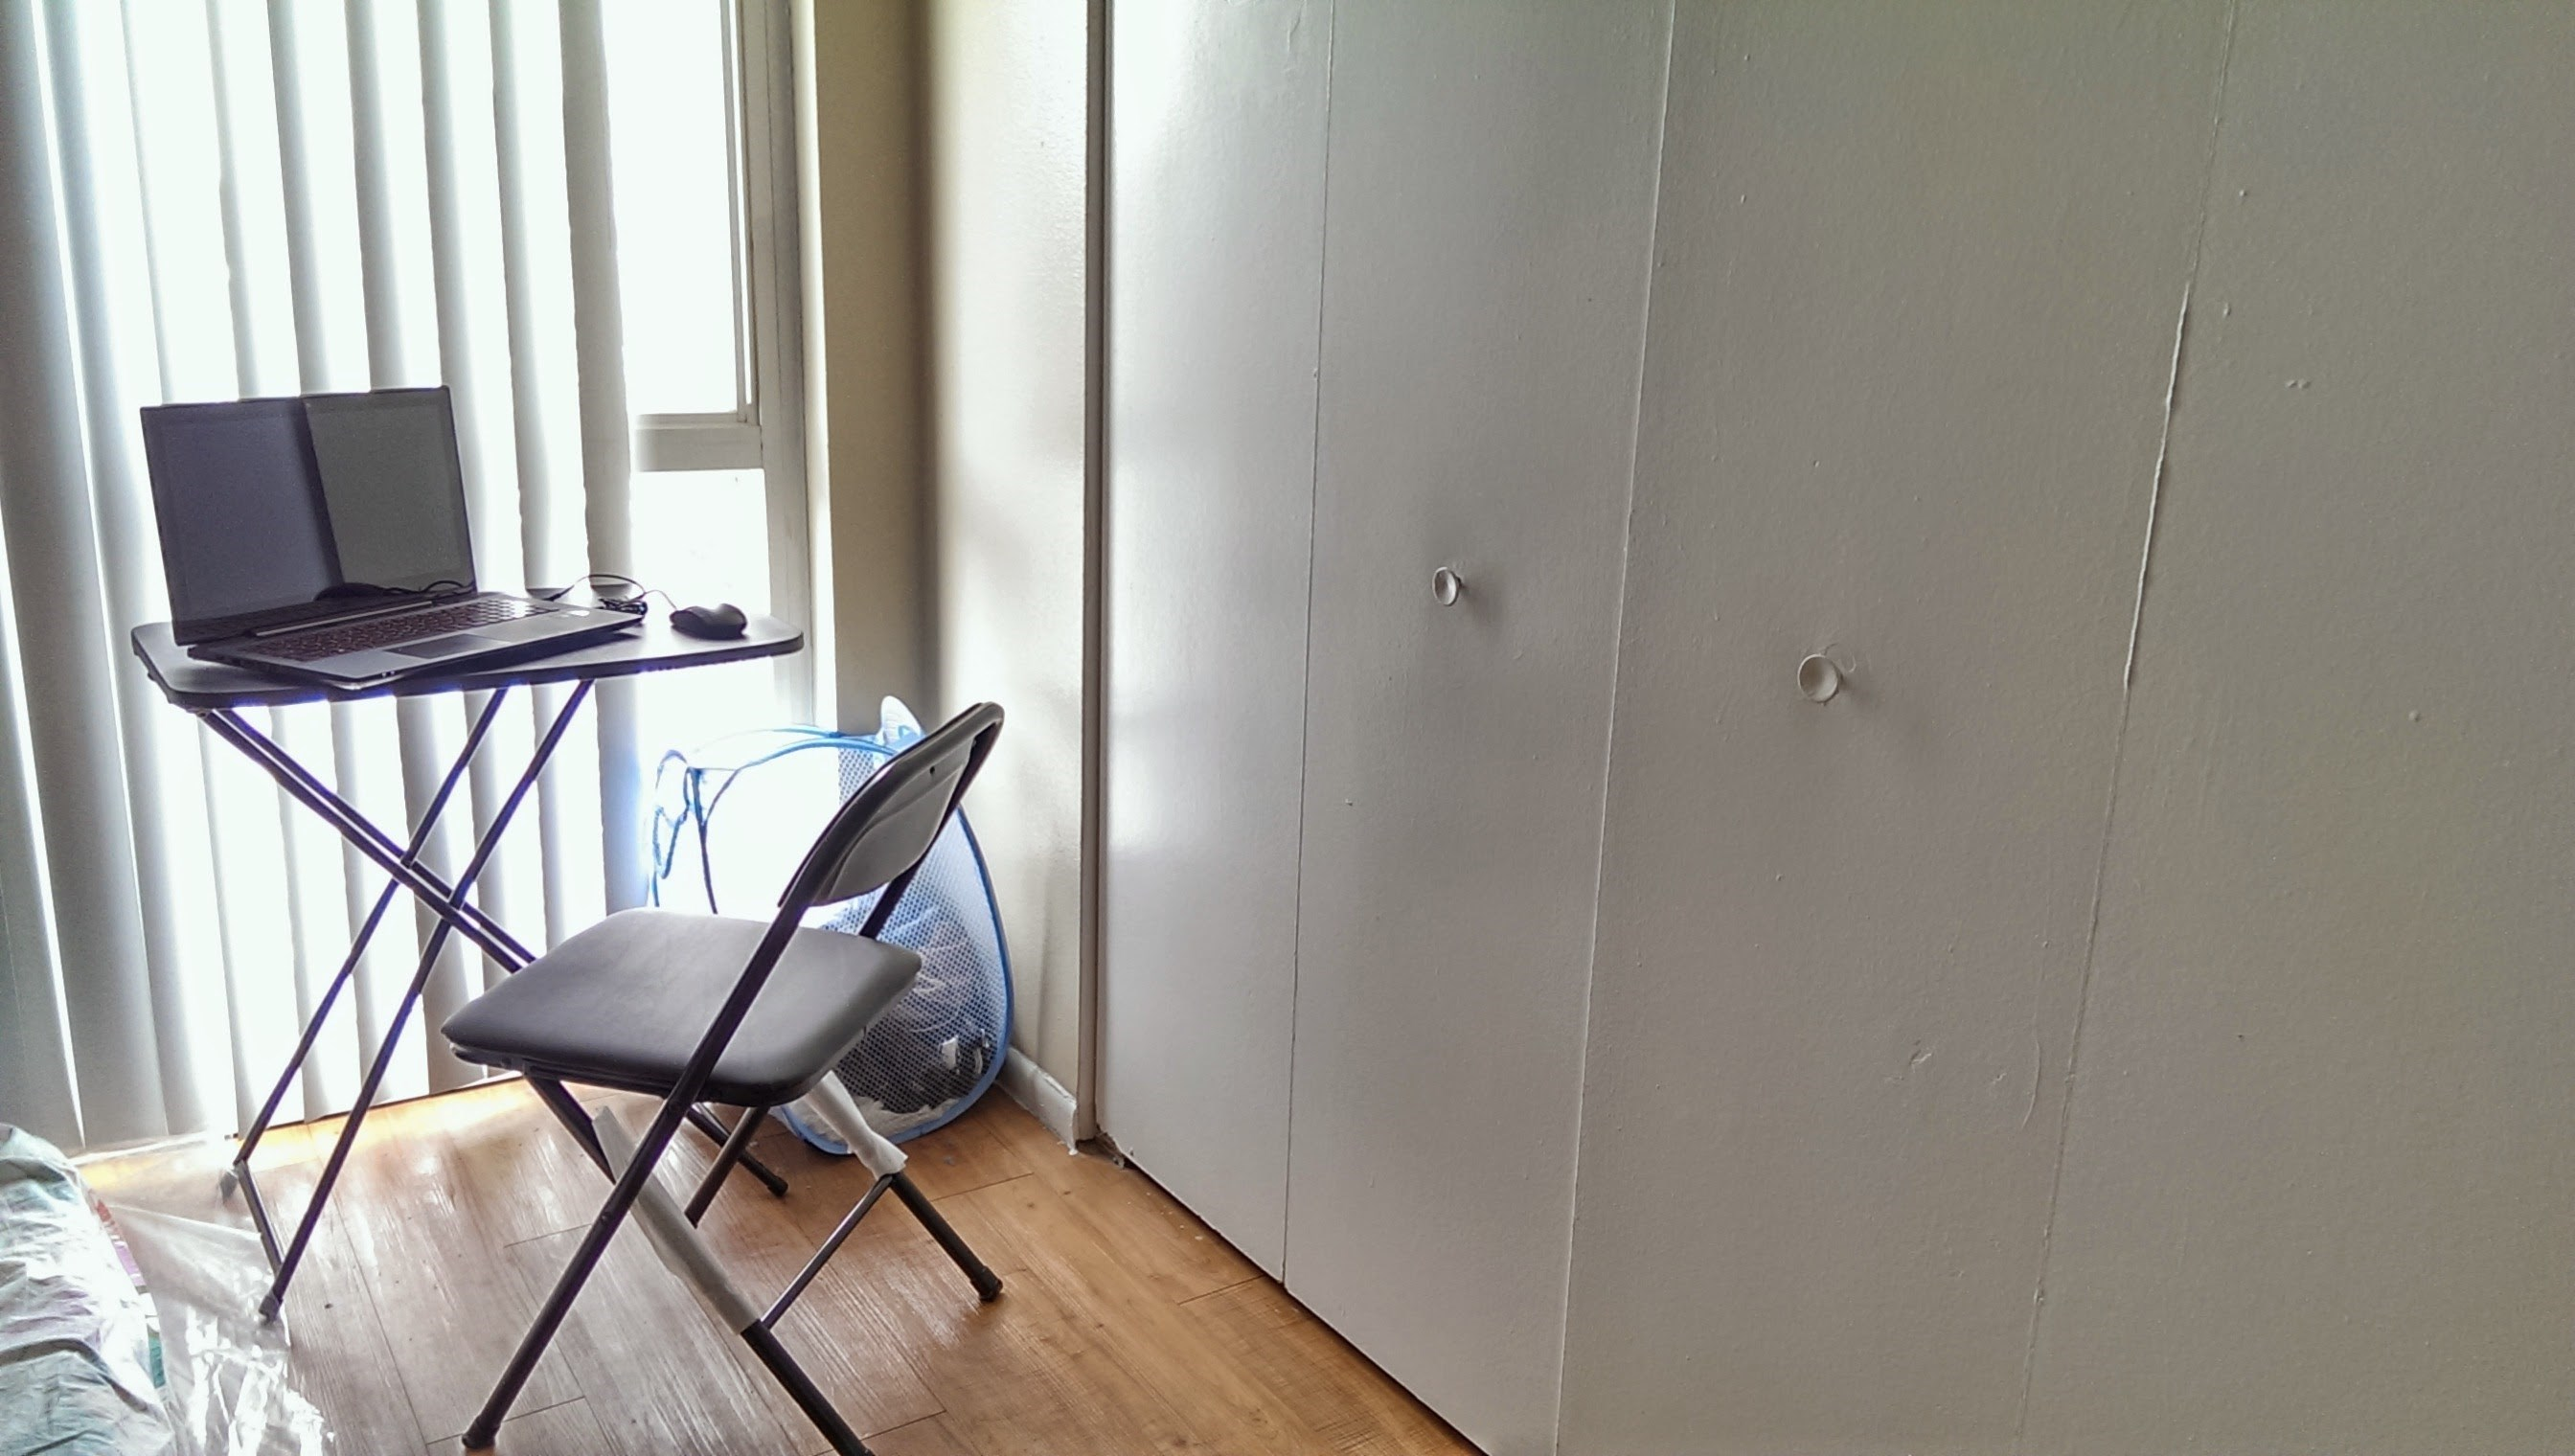 Apartment Flats To Rent In Denver Metro Area 1bhk 2bhk 3bhk 4bhk Rentals Sulekha Rentals